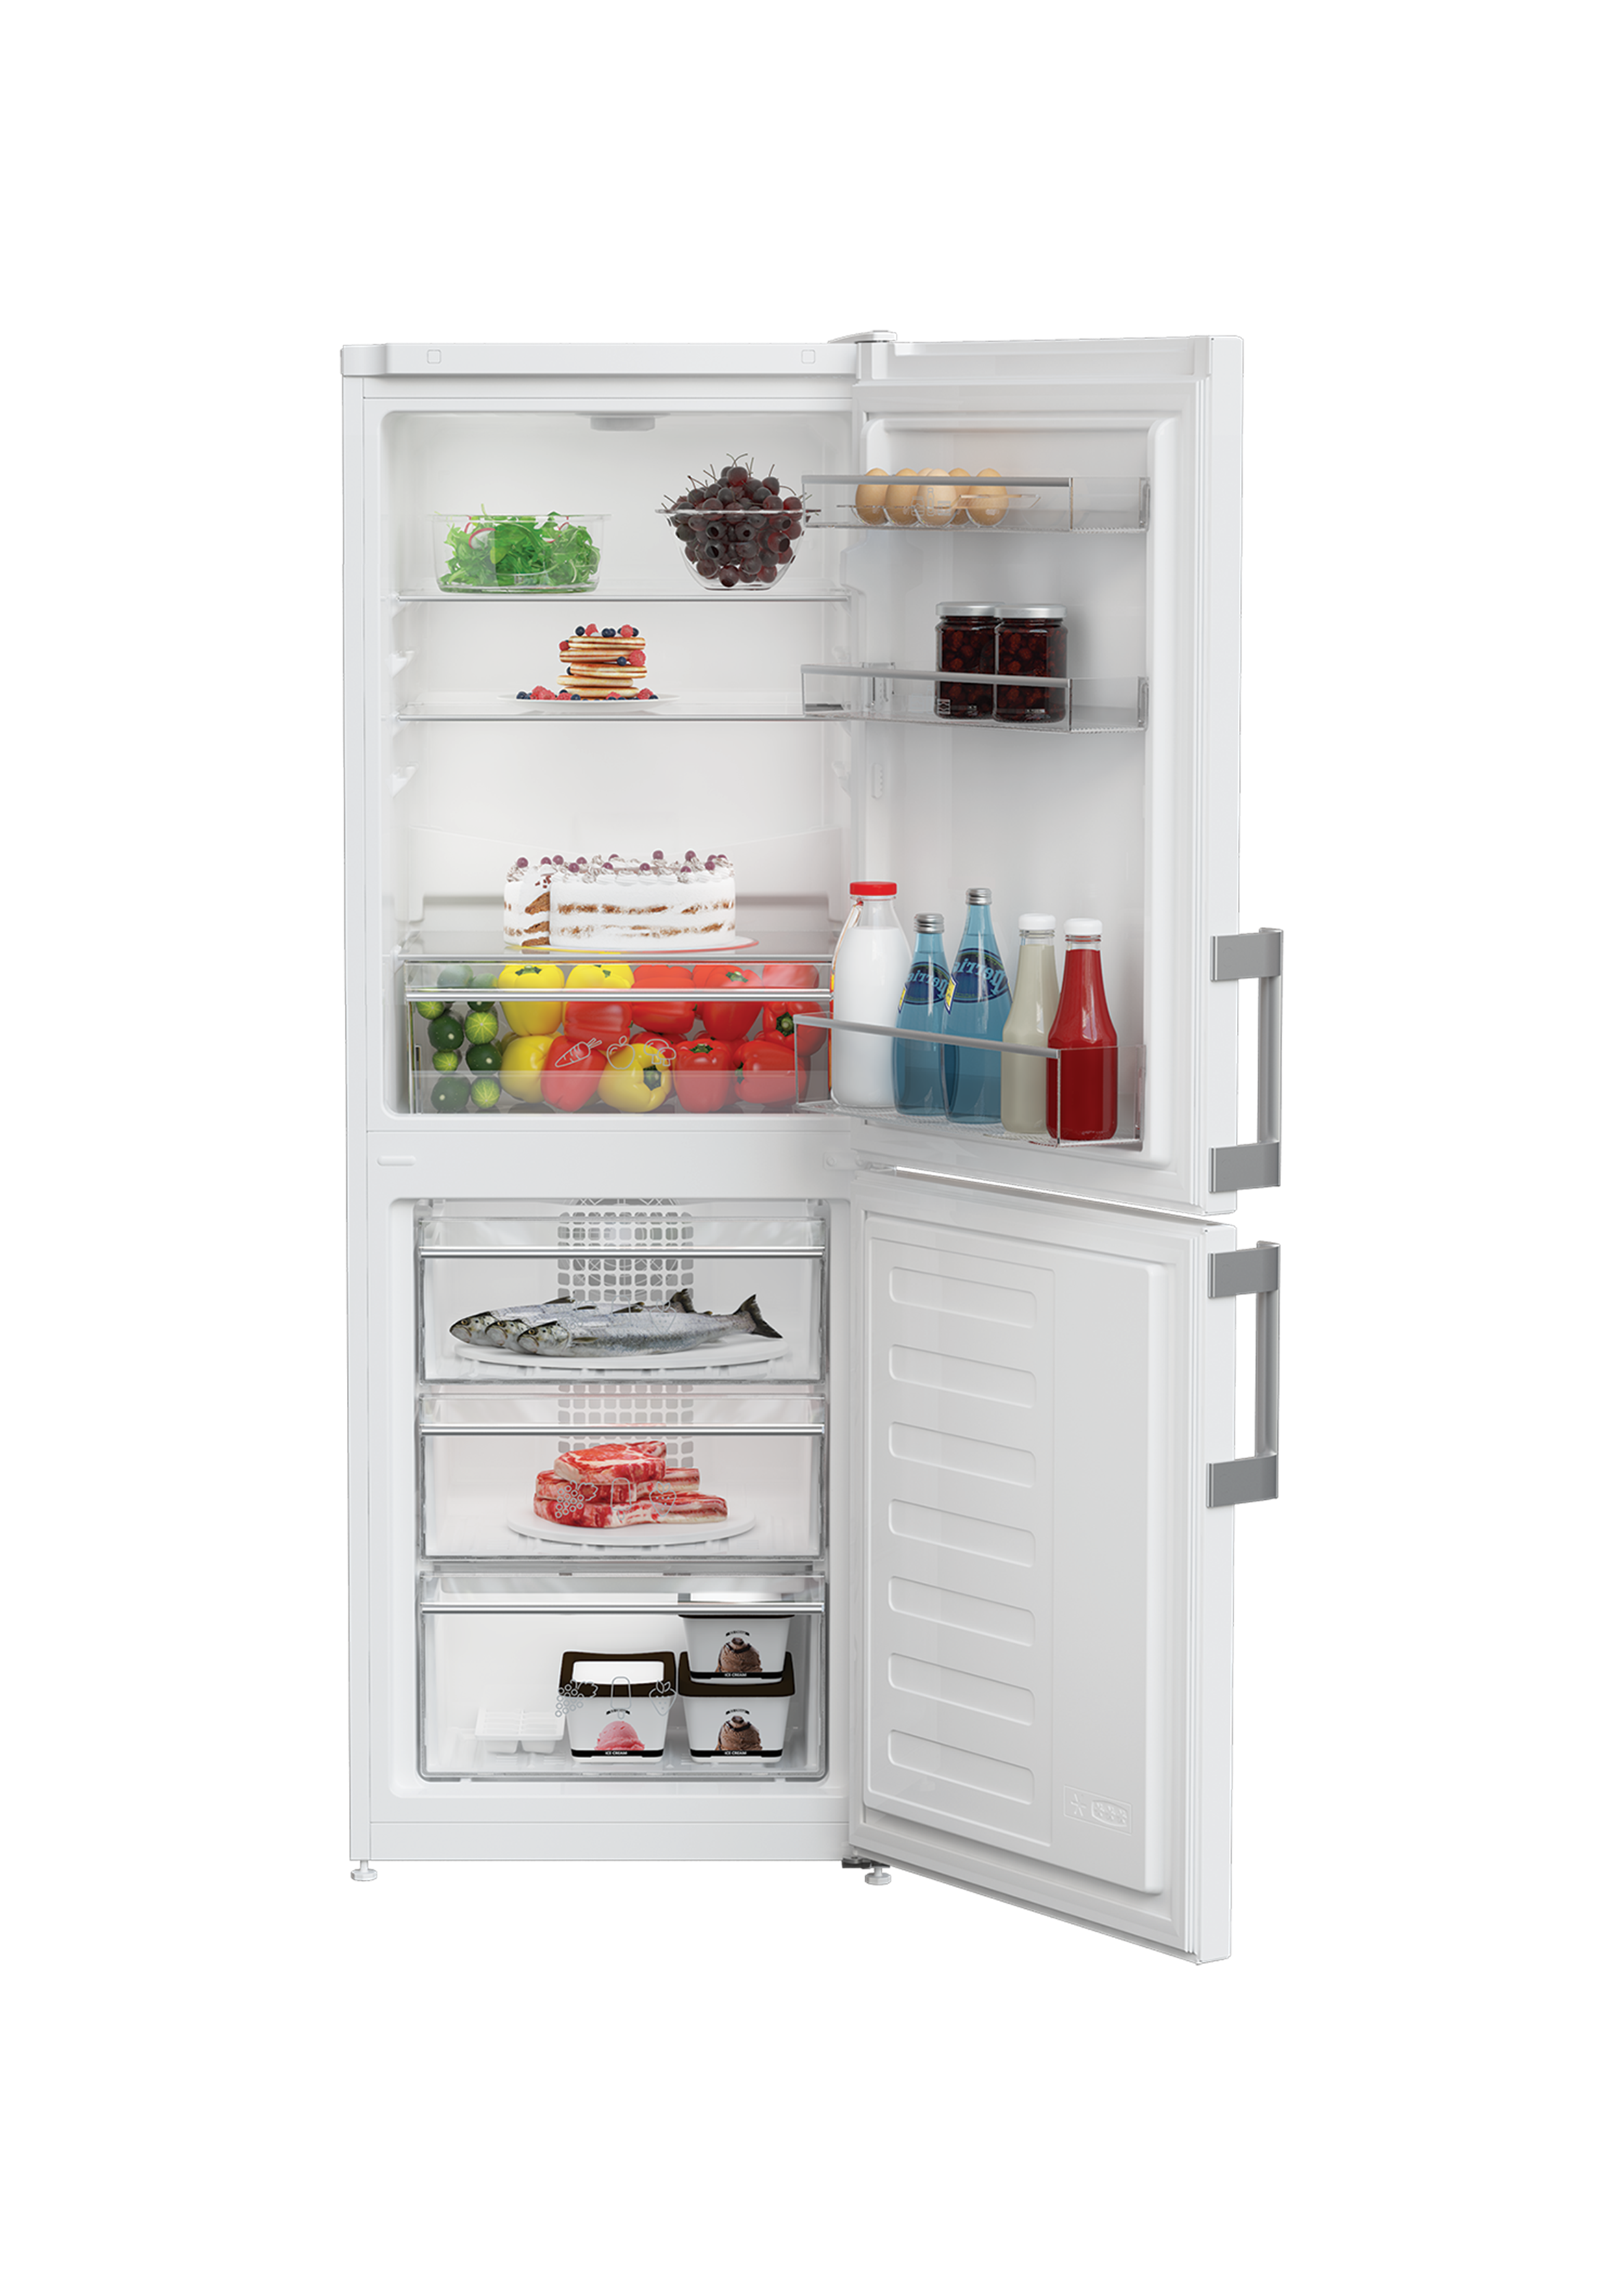 Kgm4530 Frost Free Combi Fridge Freezer